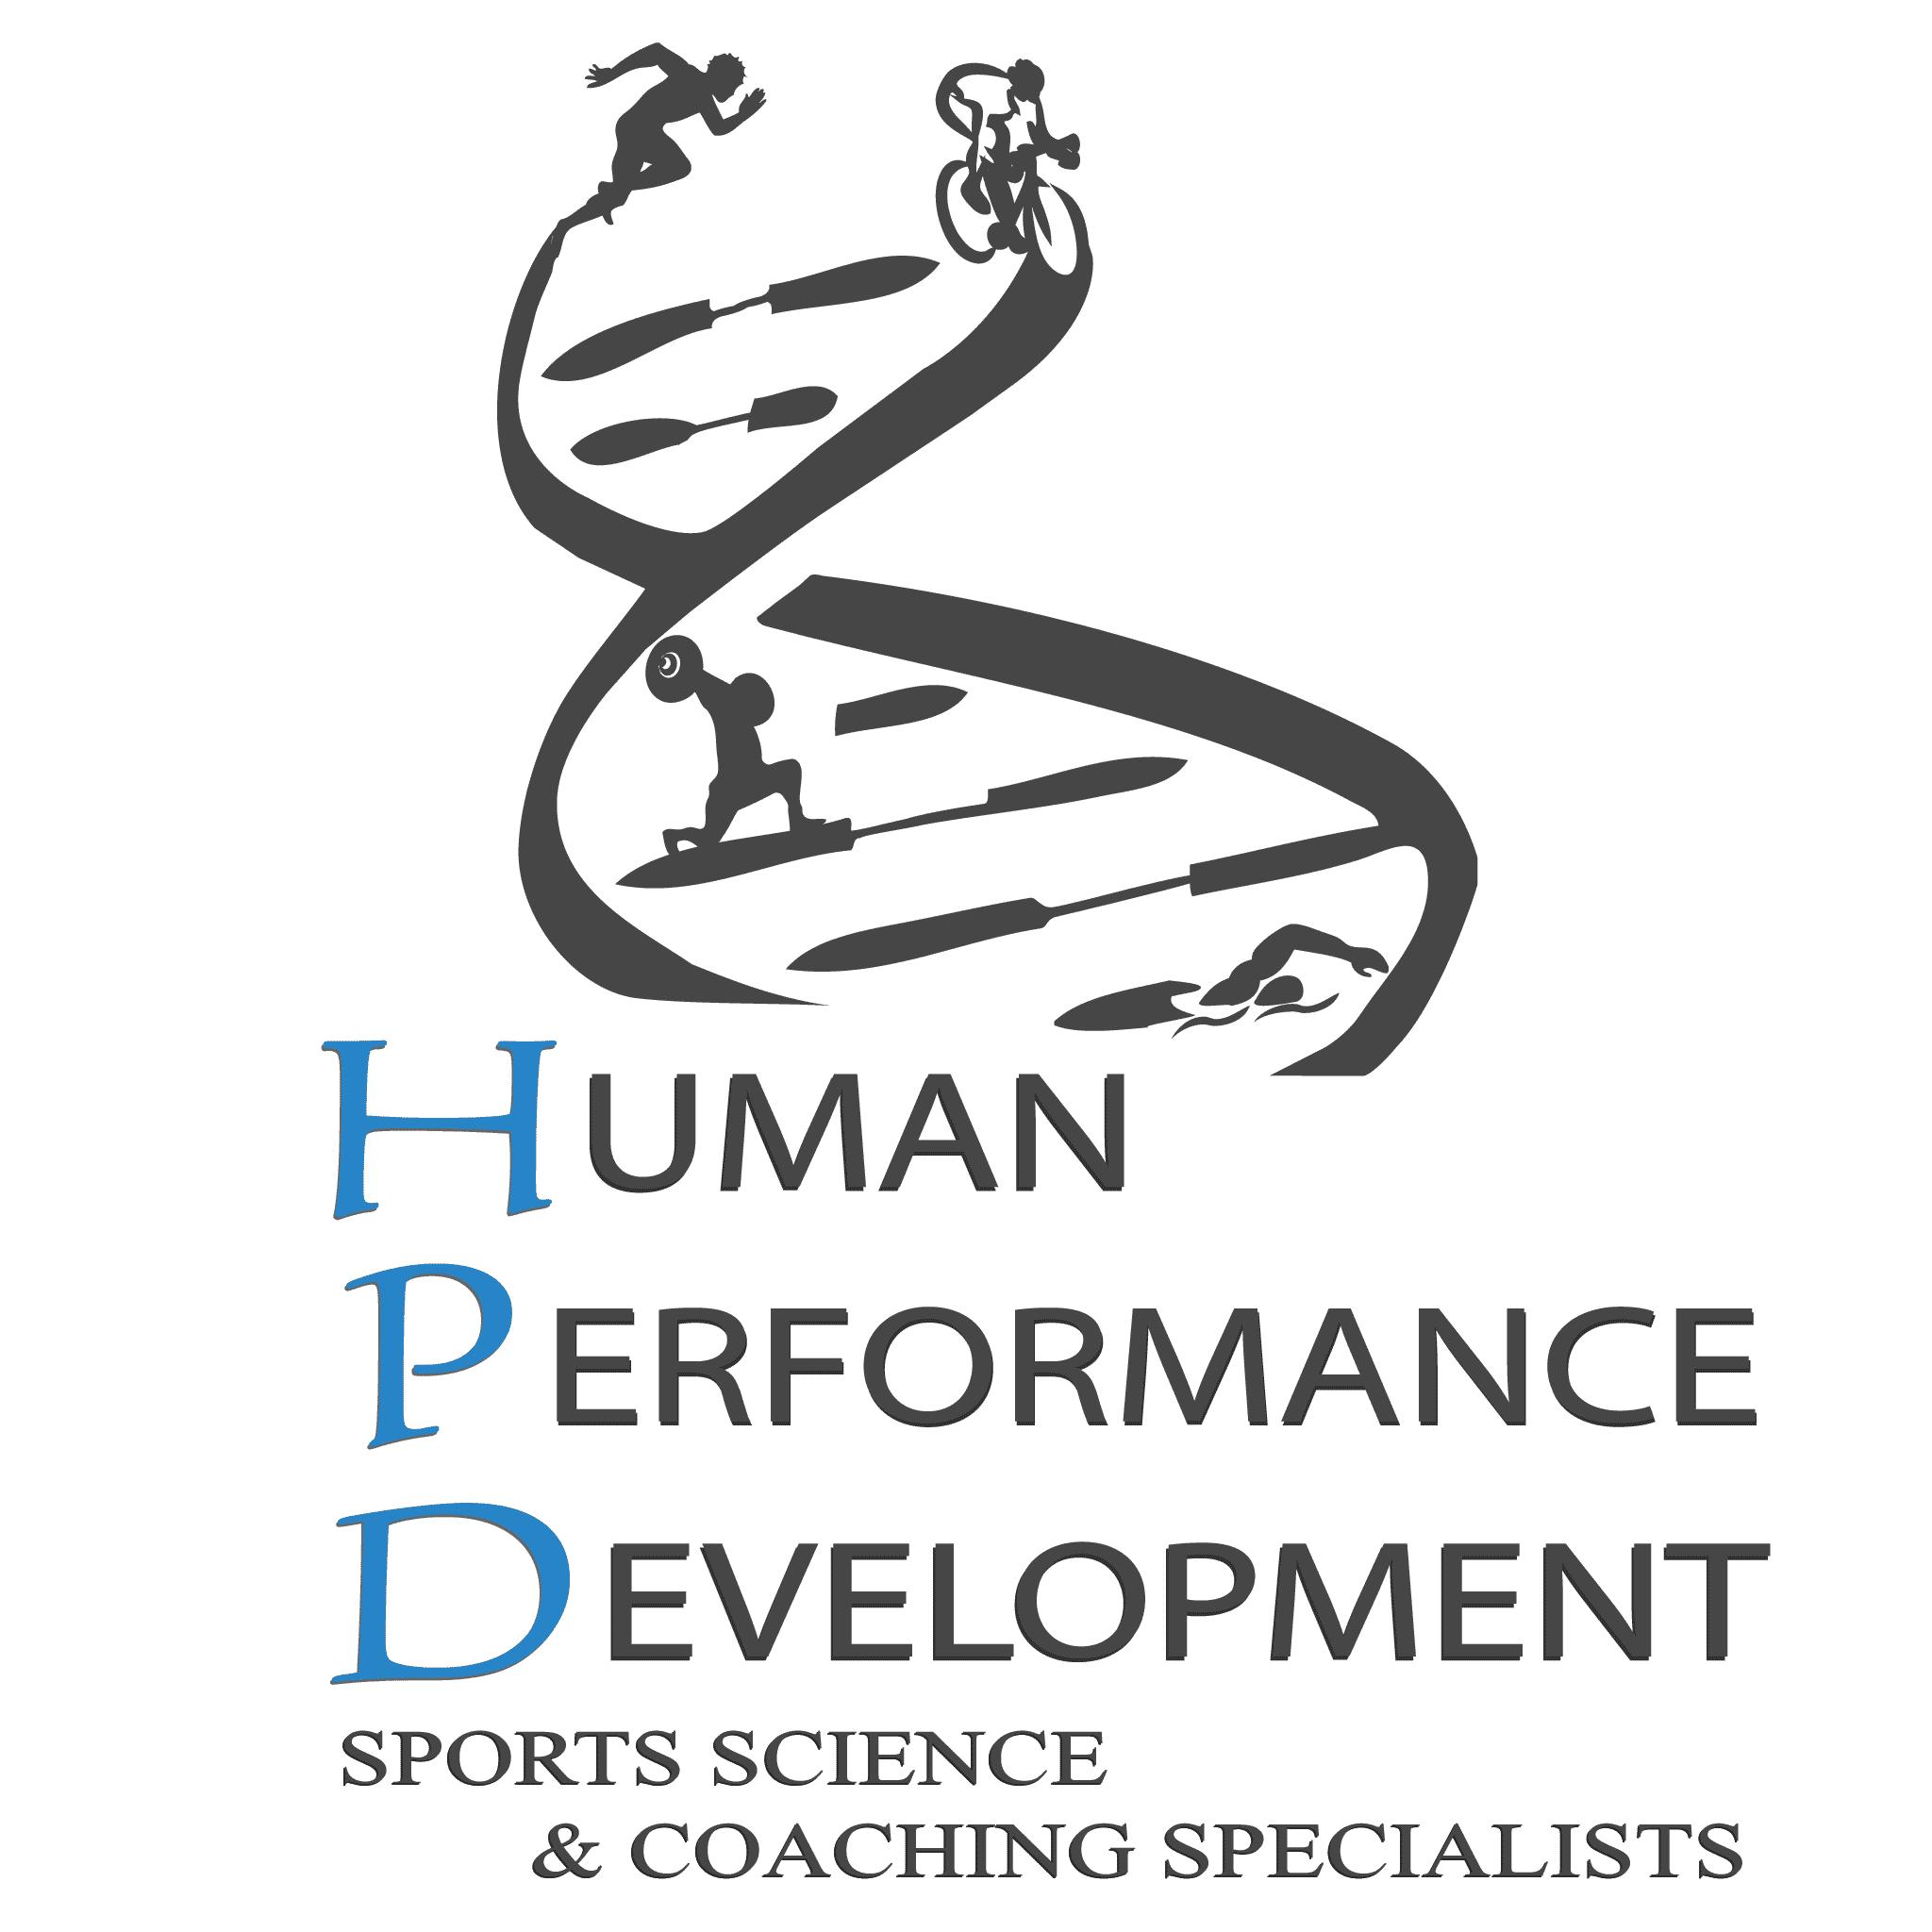 Human Performance Development Logo